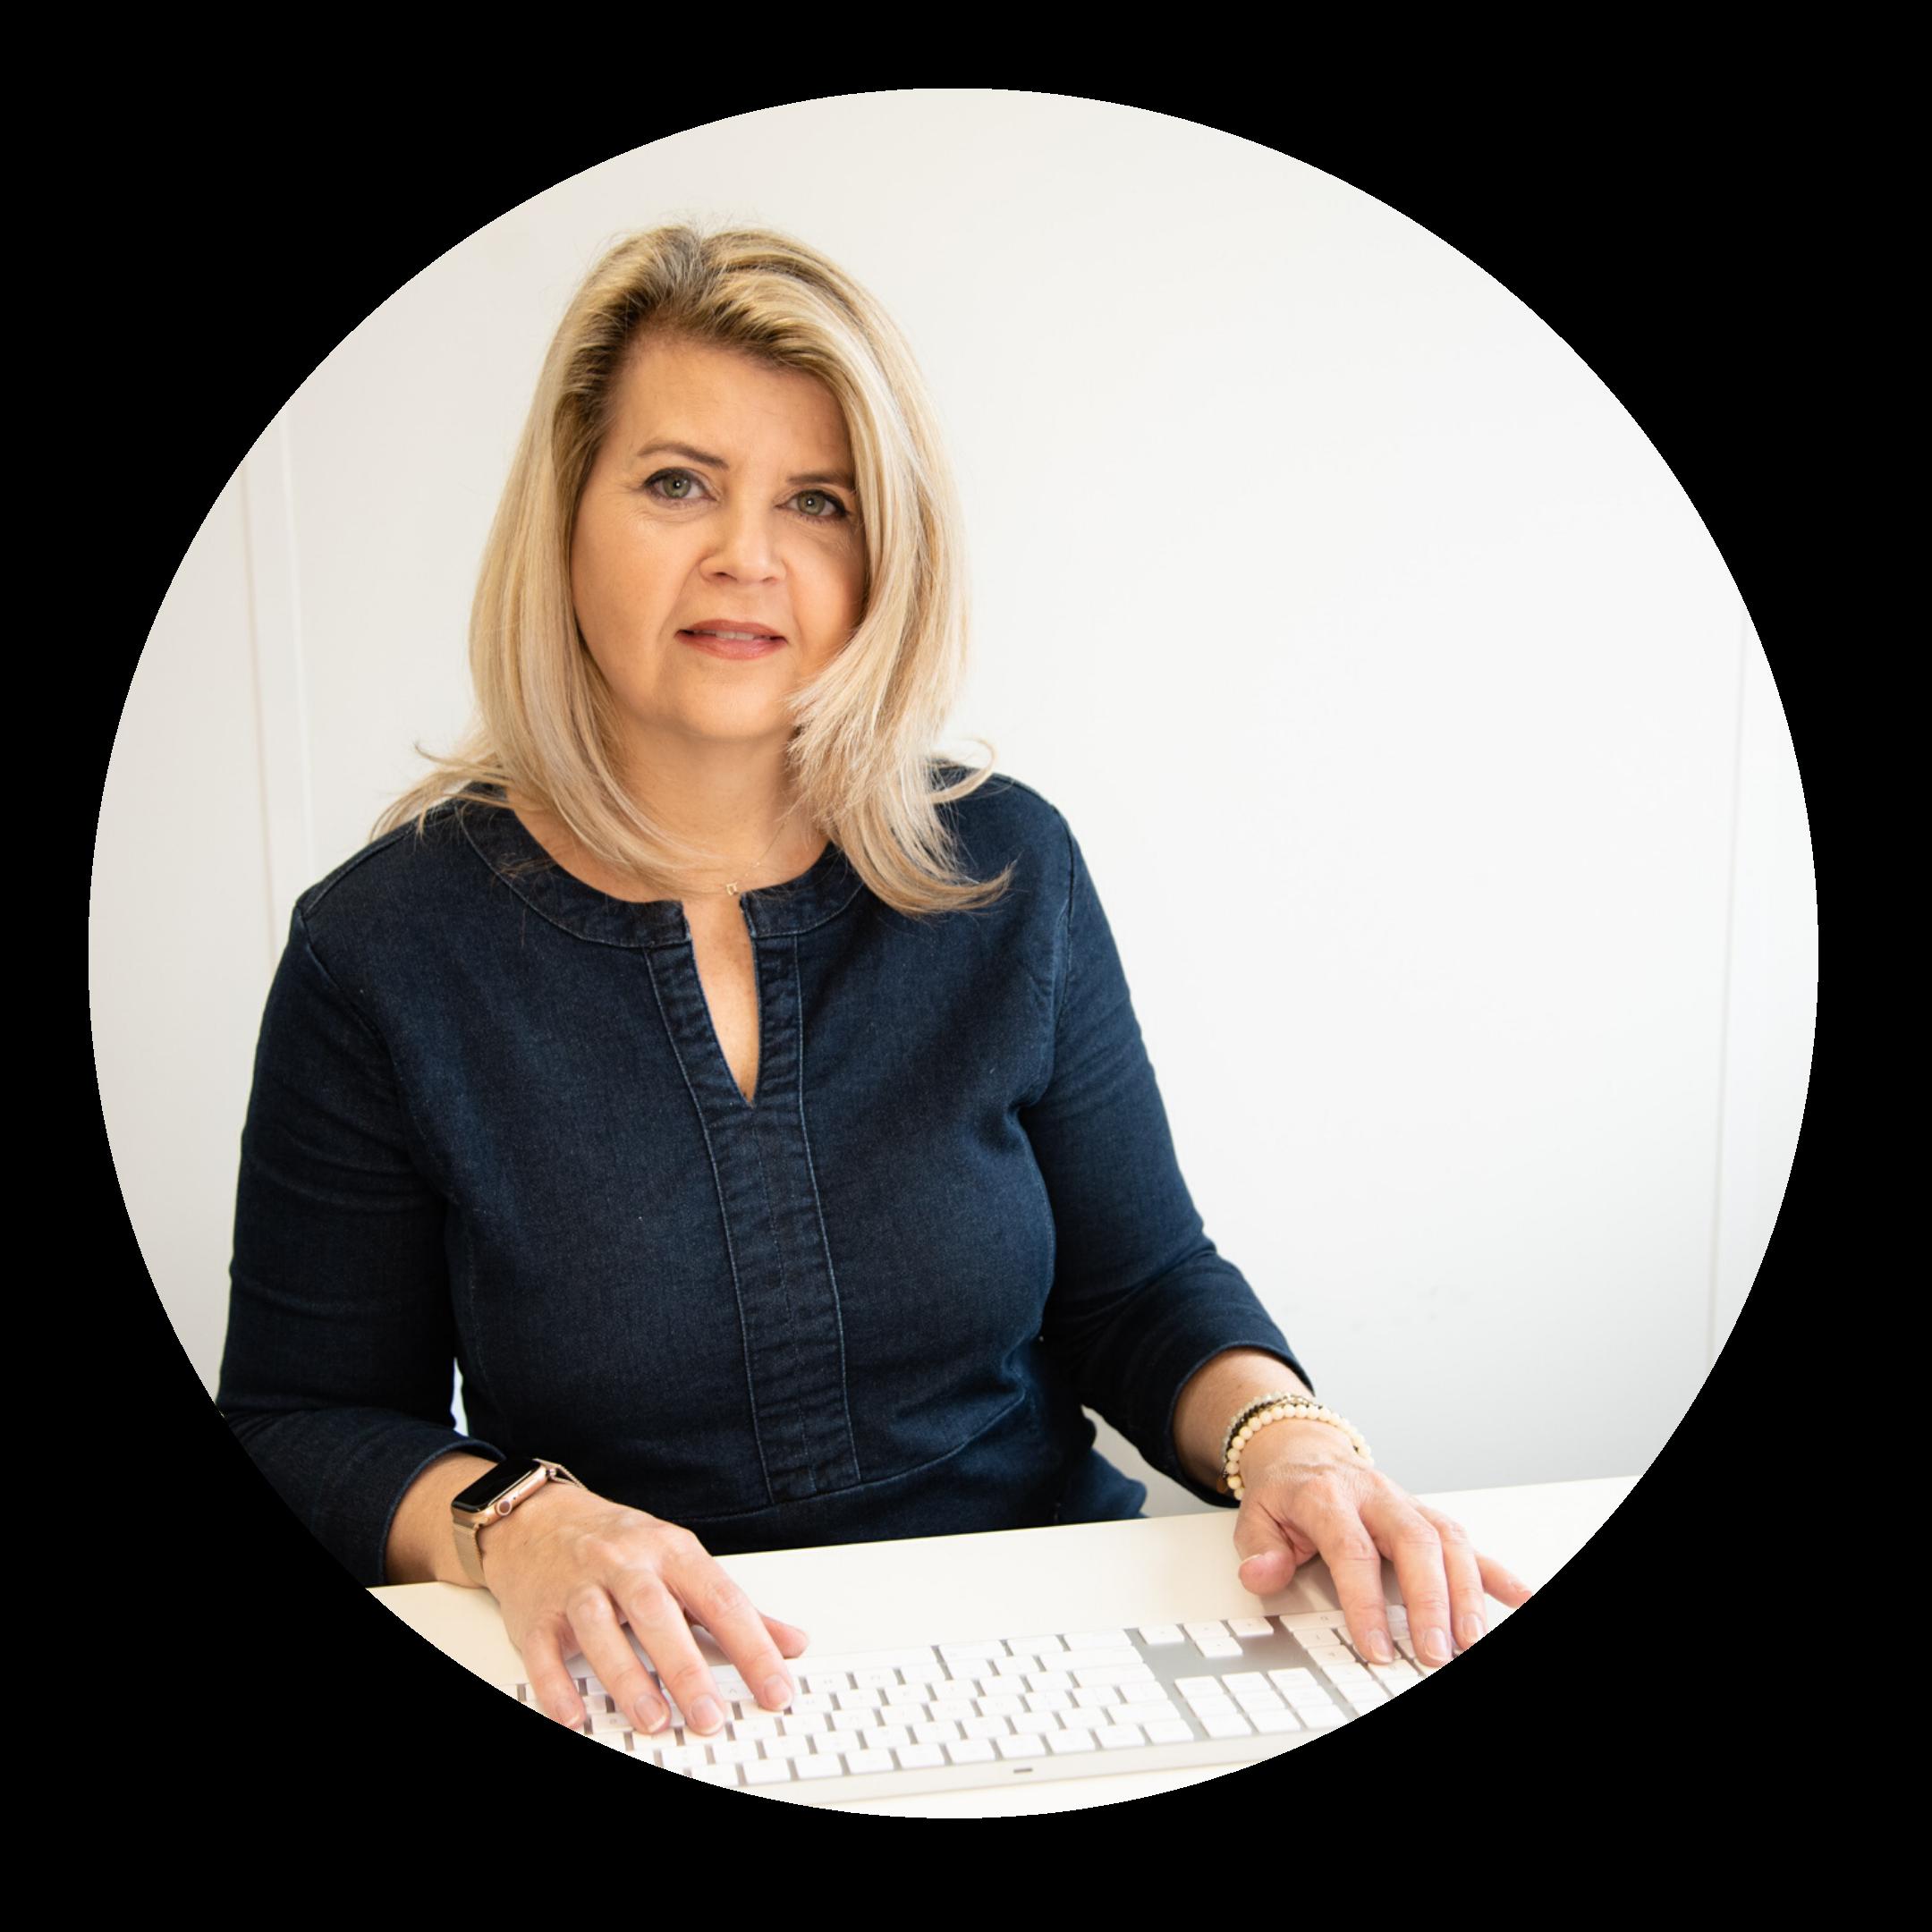 Danielle Navas-Brandt MBA